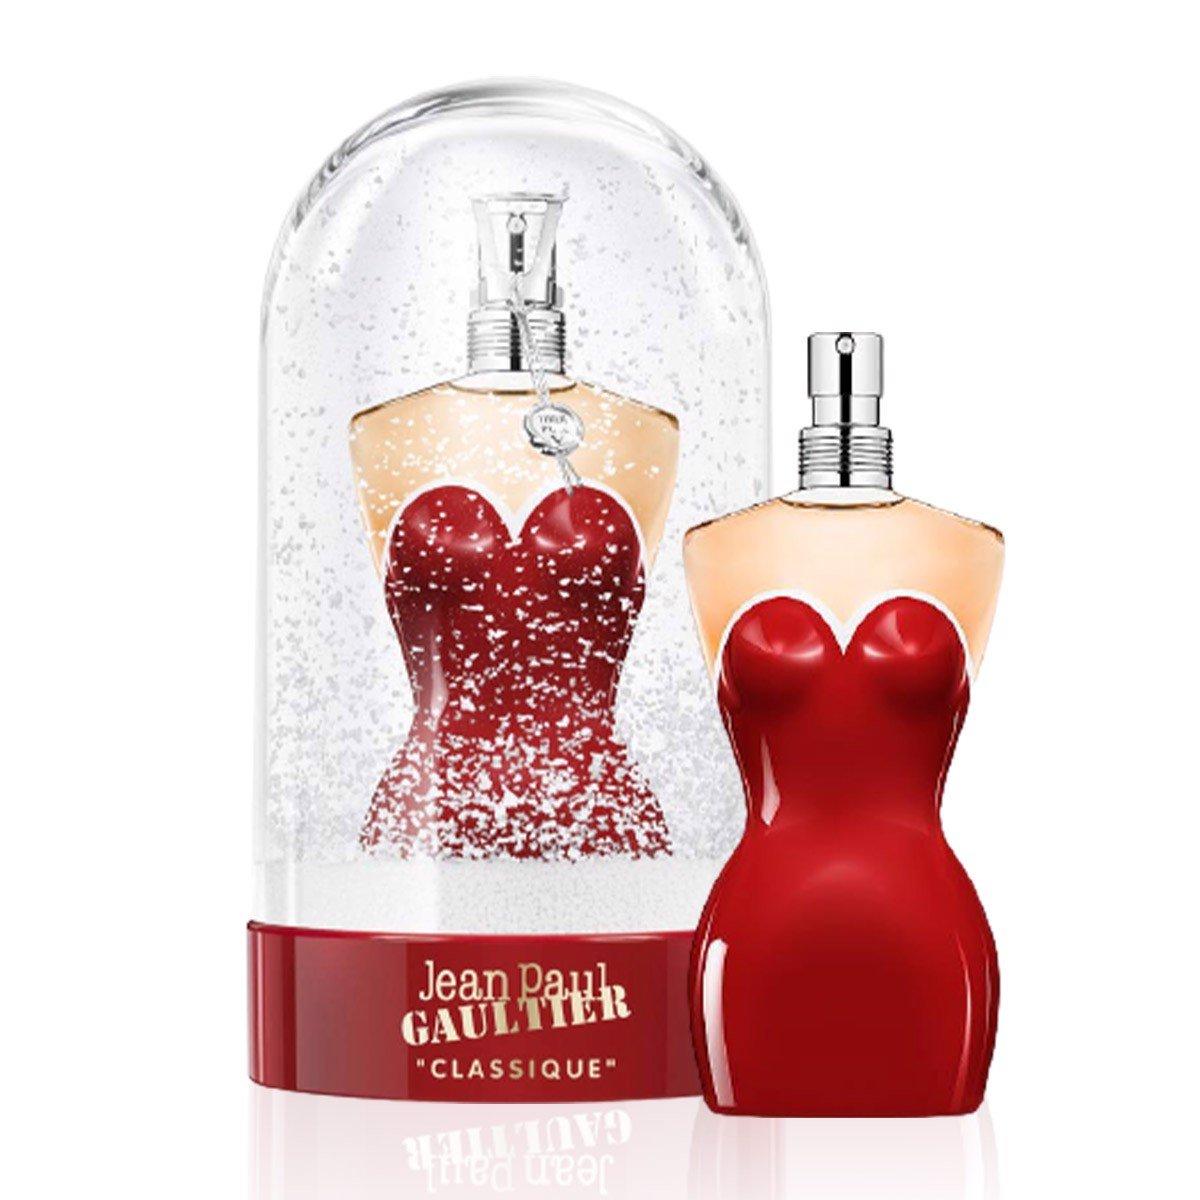 Nước hoa Jean Paul Gaultier Classique Collector Edition   namperfume